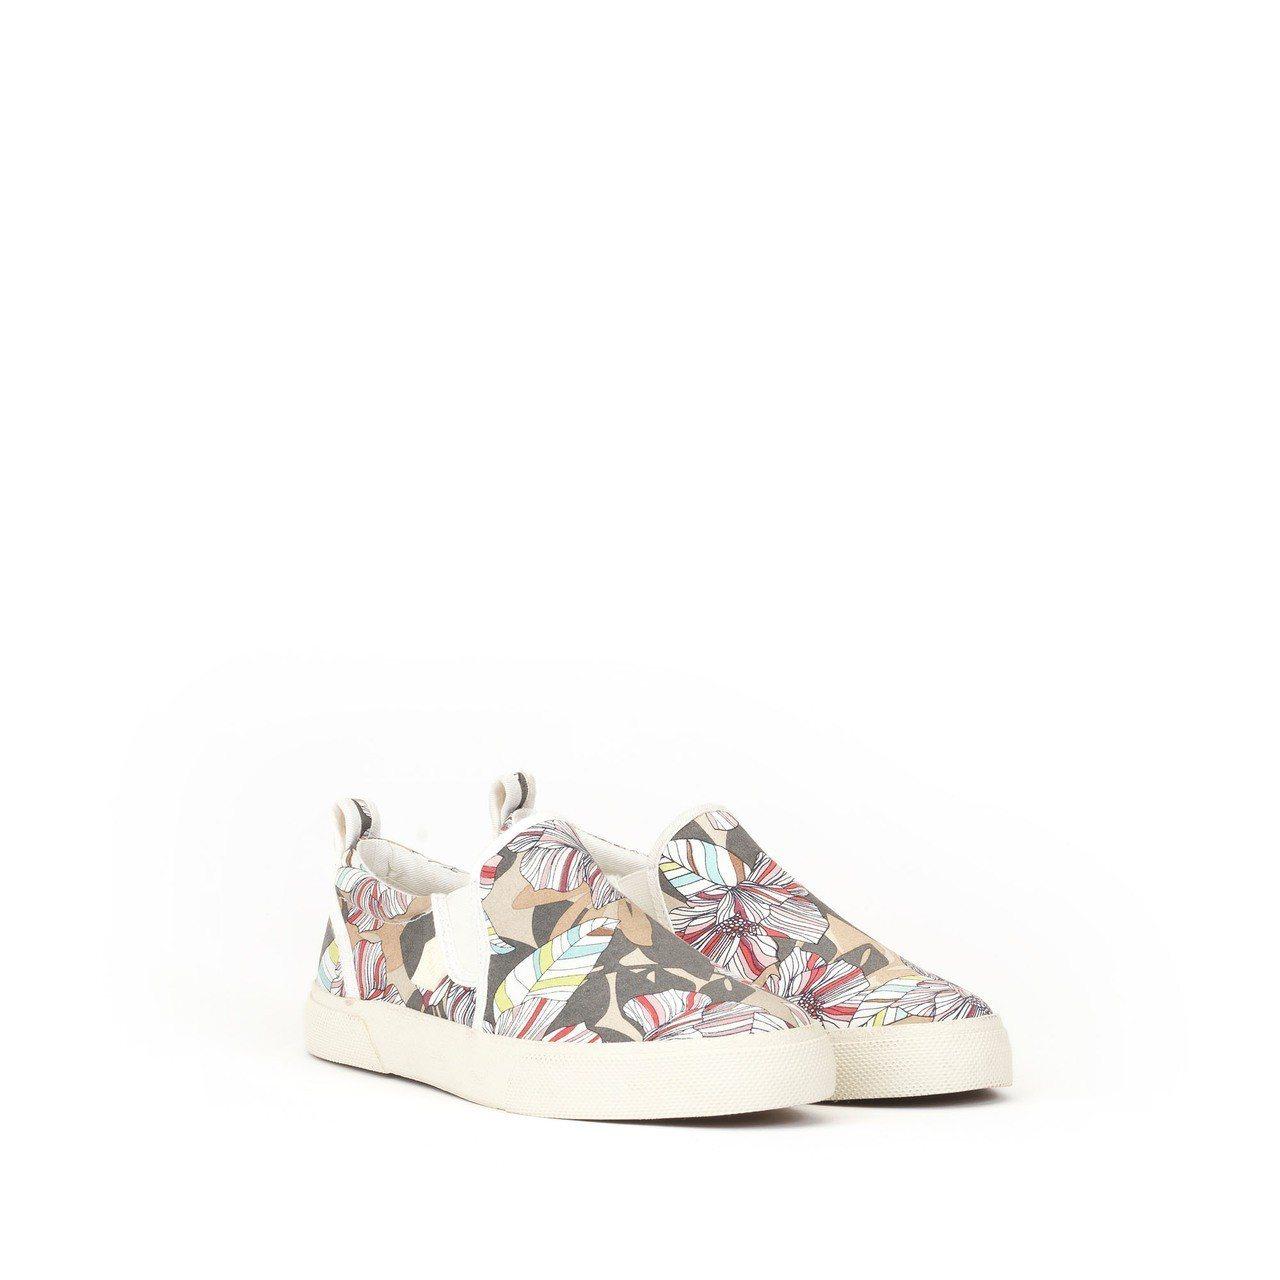 Aigle女款休閒便鞋,約3,200元。圖/Aigle提供